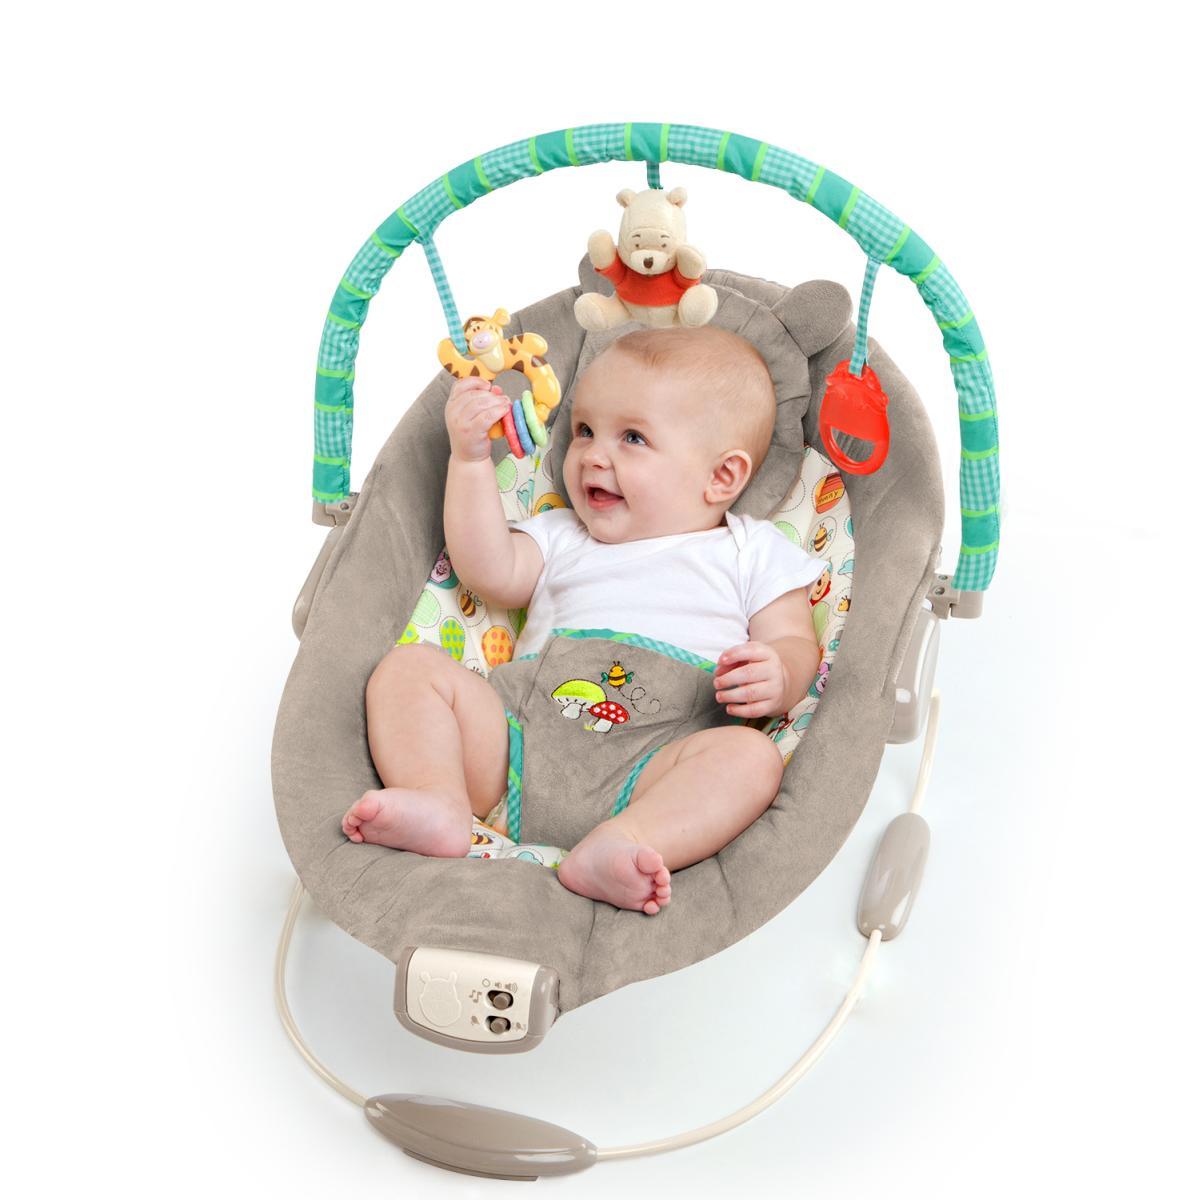 disney baby winnie the pooh babyschaukel. Black Bedroom Furniture Sets. Home Design Ideas